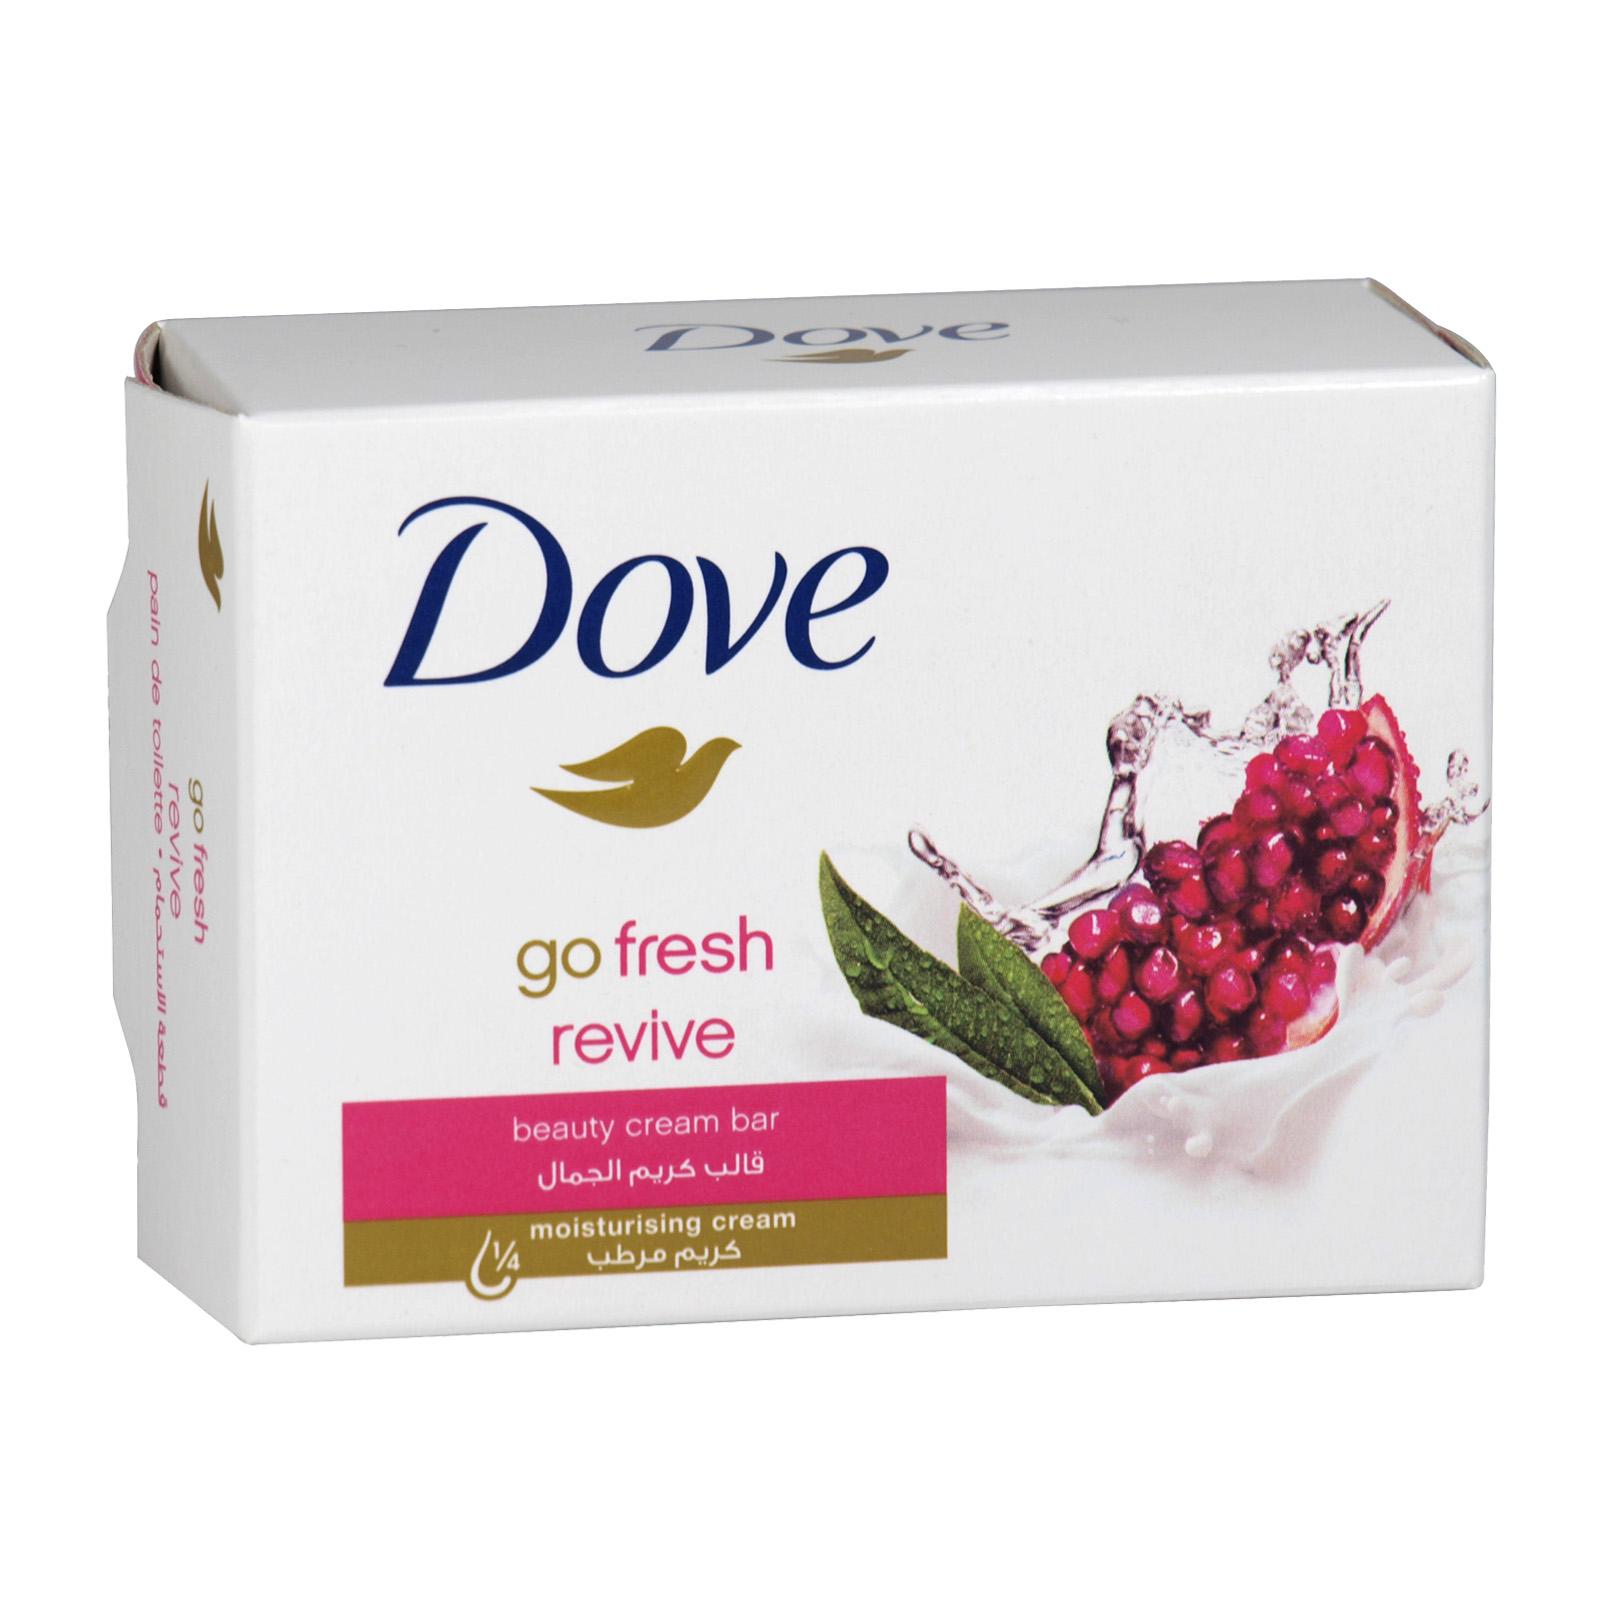 DOVE SOAP 100GM GO FRESH REVIVE X 48